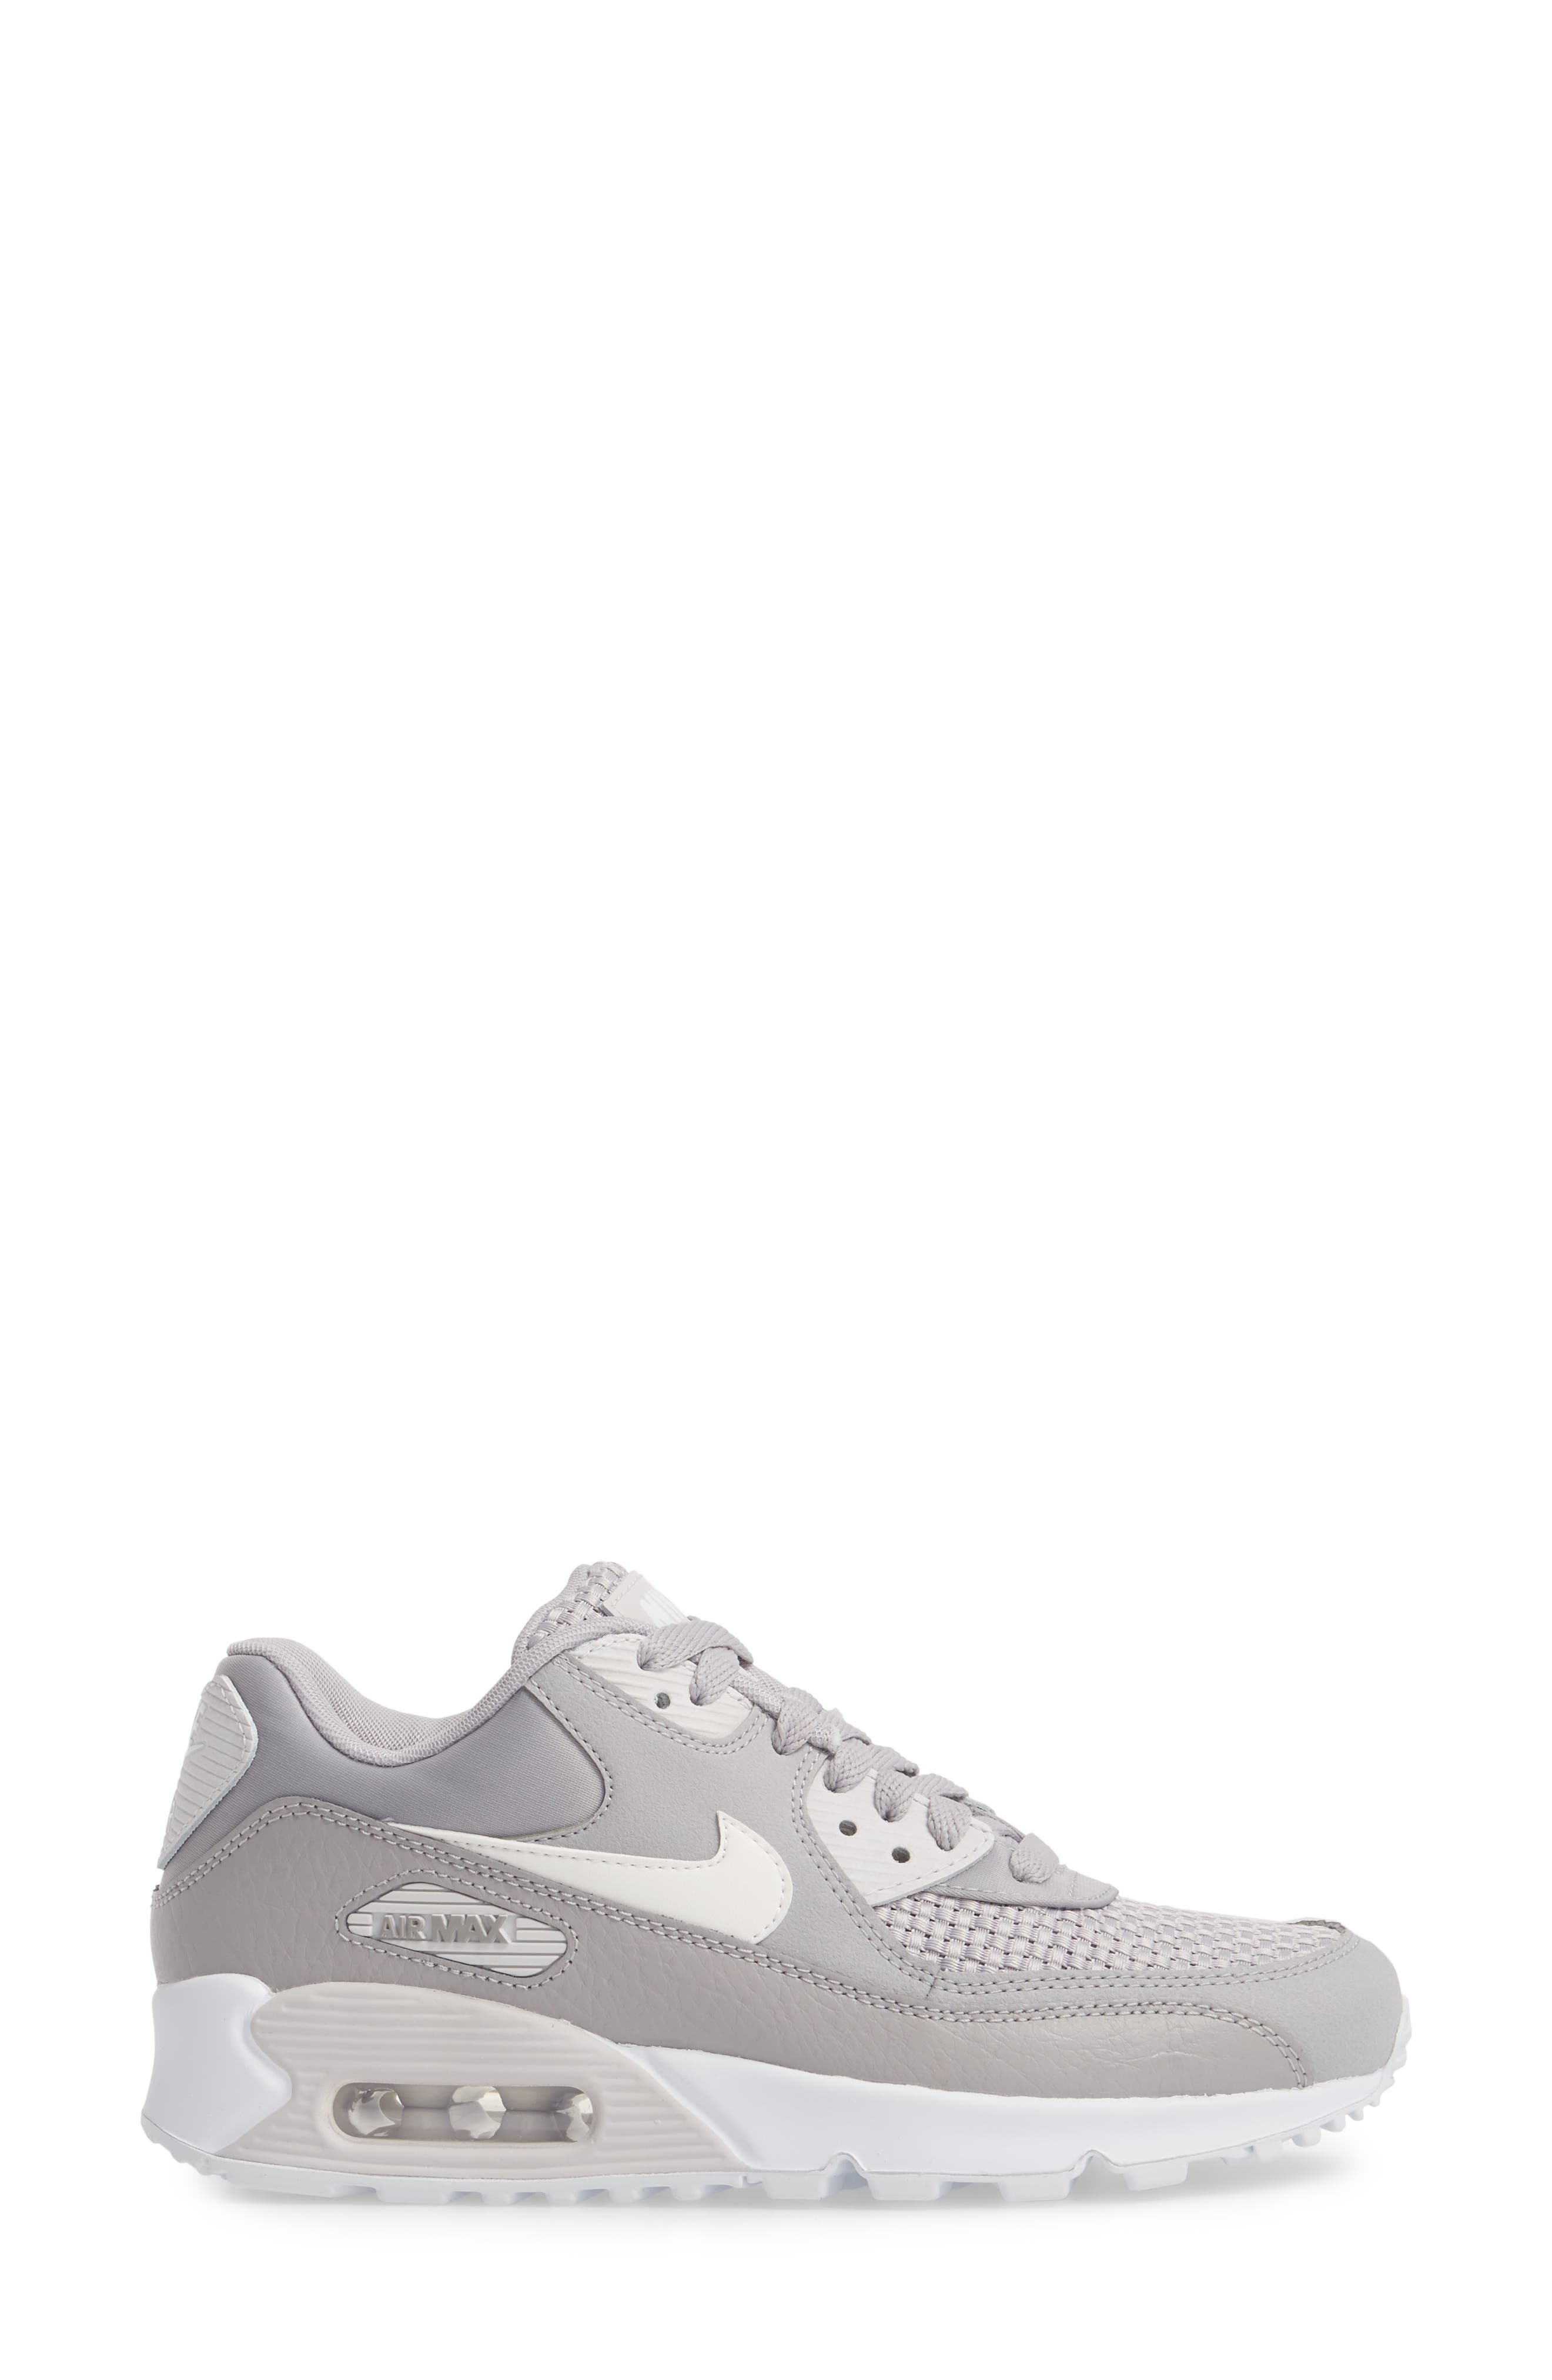 Air Max 90 SE Sneaker,                             Alternate thumbnail 19, color,